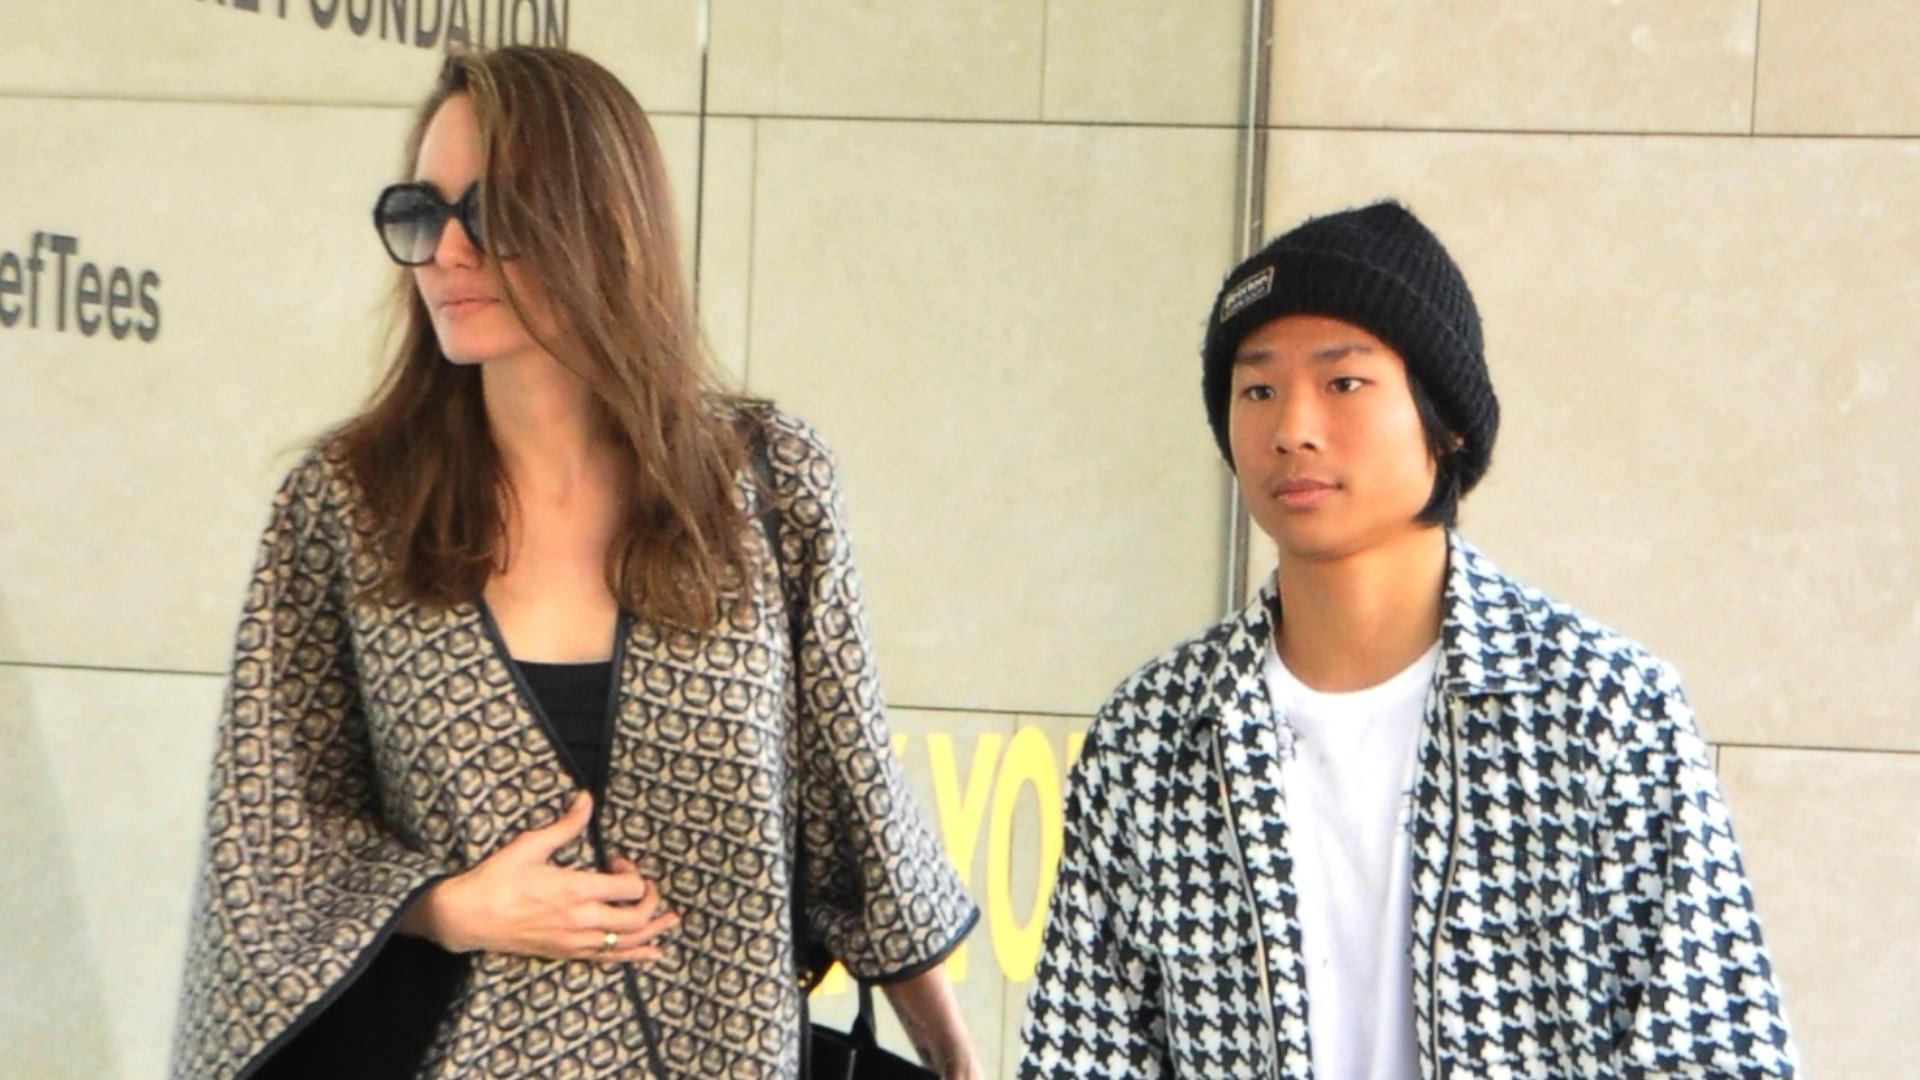 15-letni Pax, syn Jolie i Pitta na zakupach z matką (ZDJĘCIA)